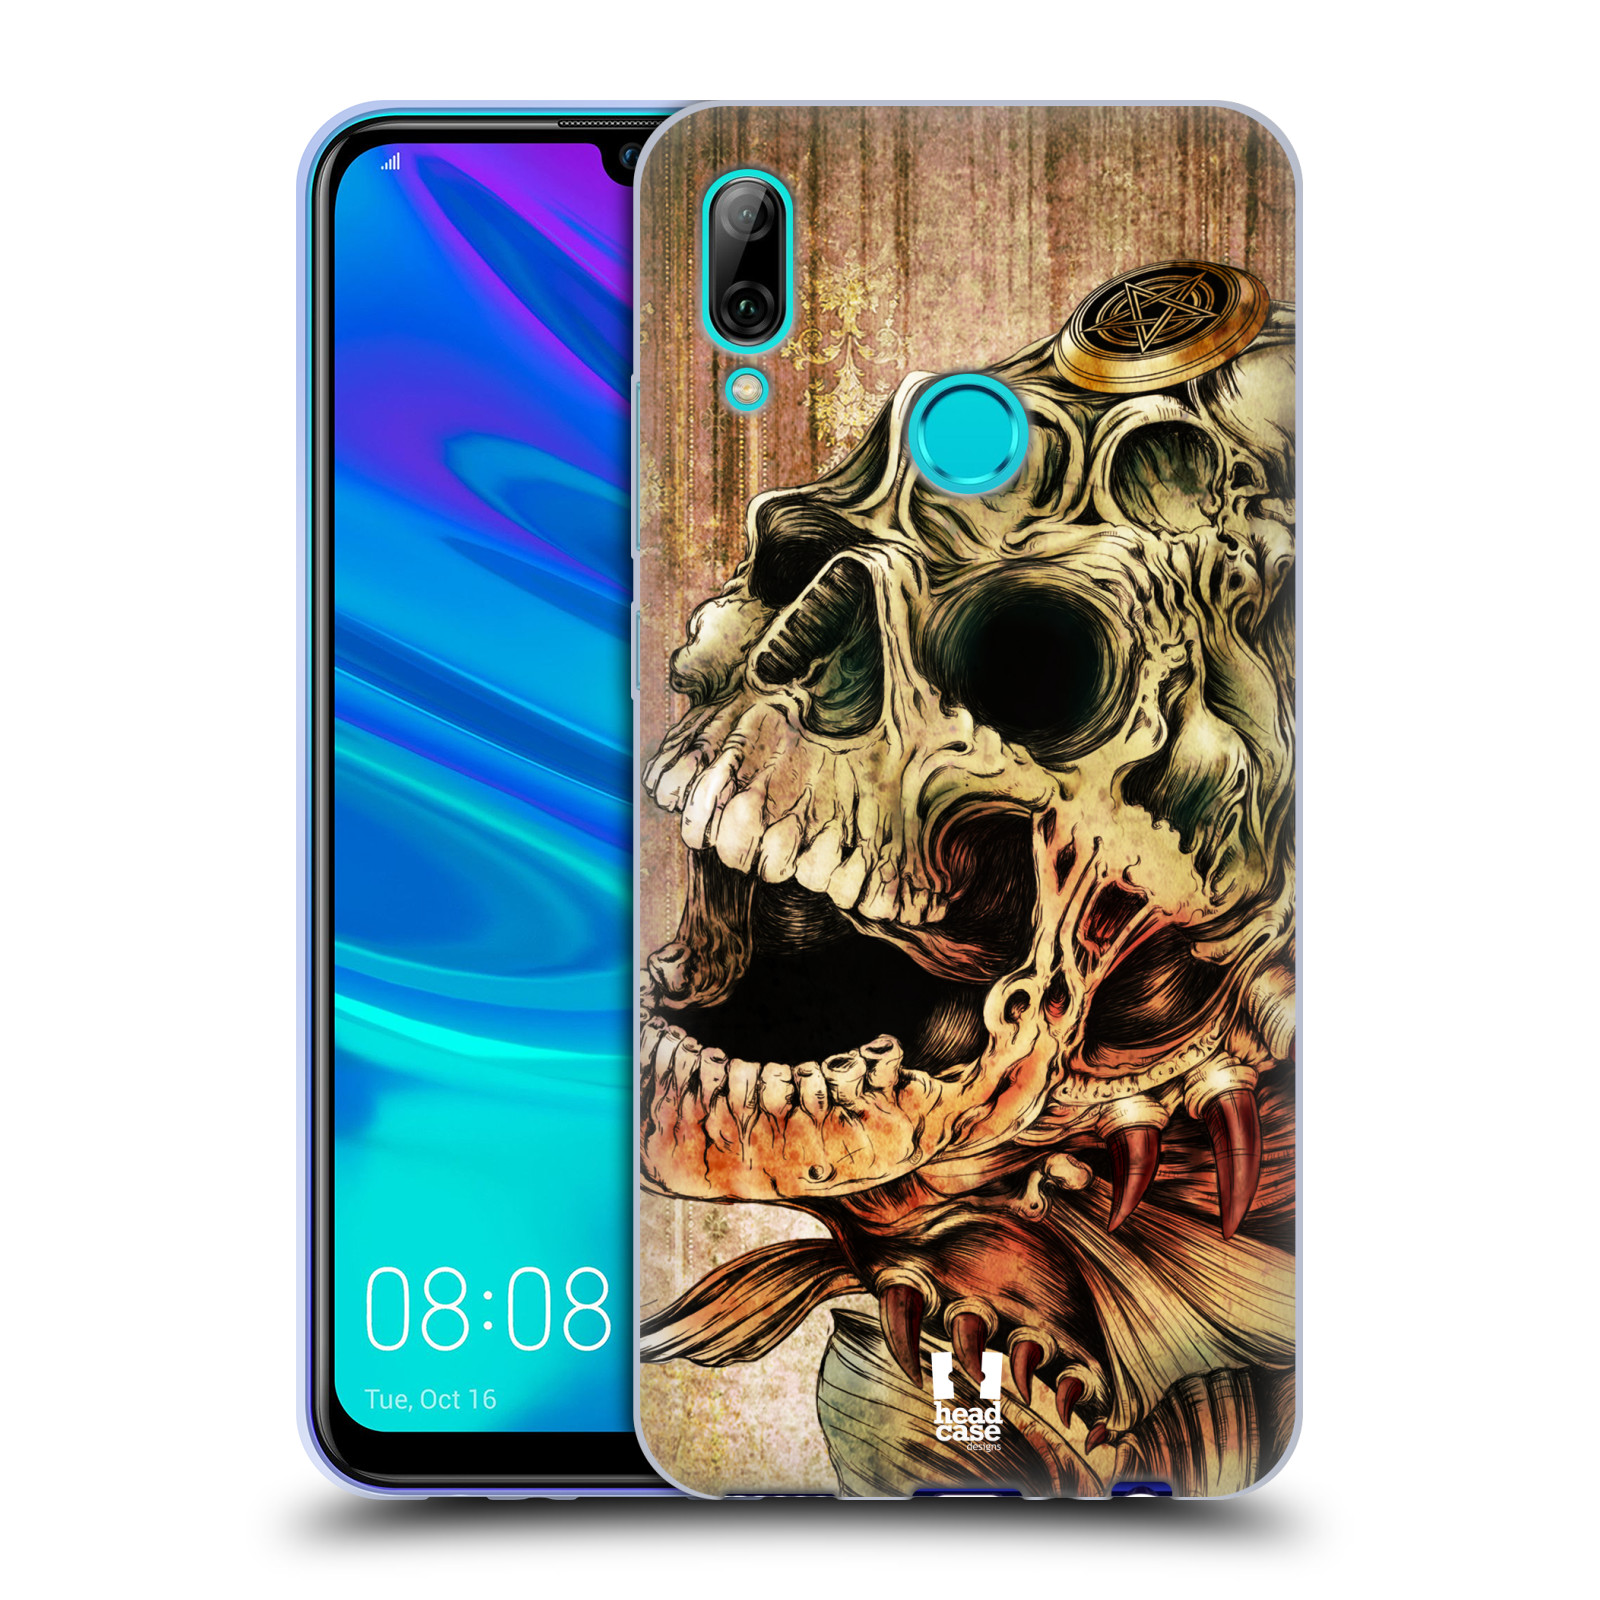 Silikonové pouzdro na mobil Huawei P Smart (2019) - Head Case - PIRANHA